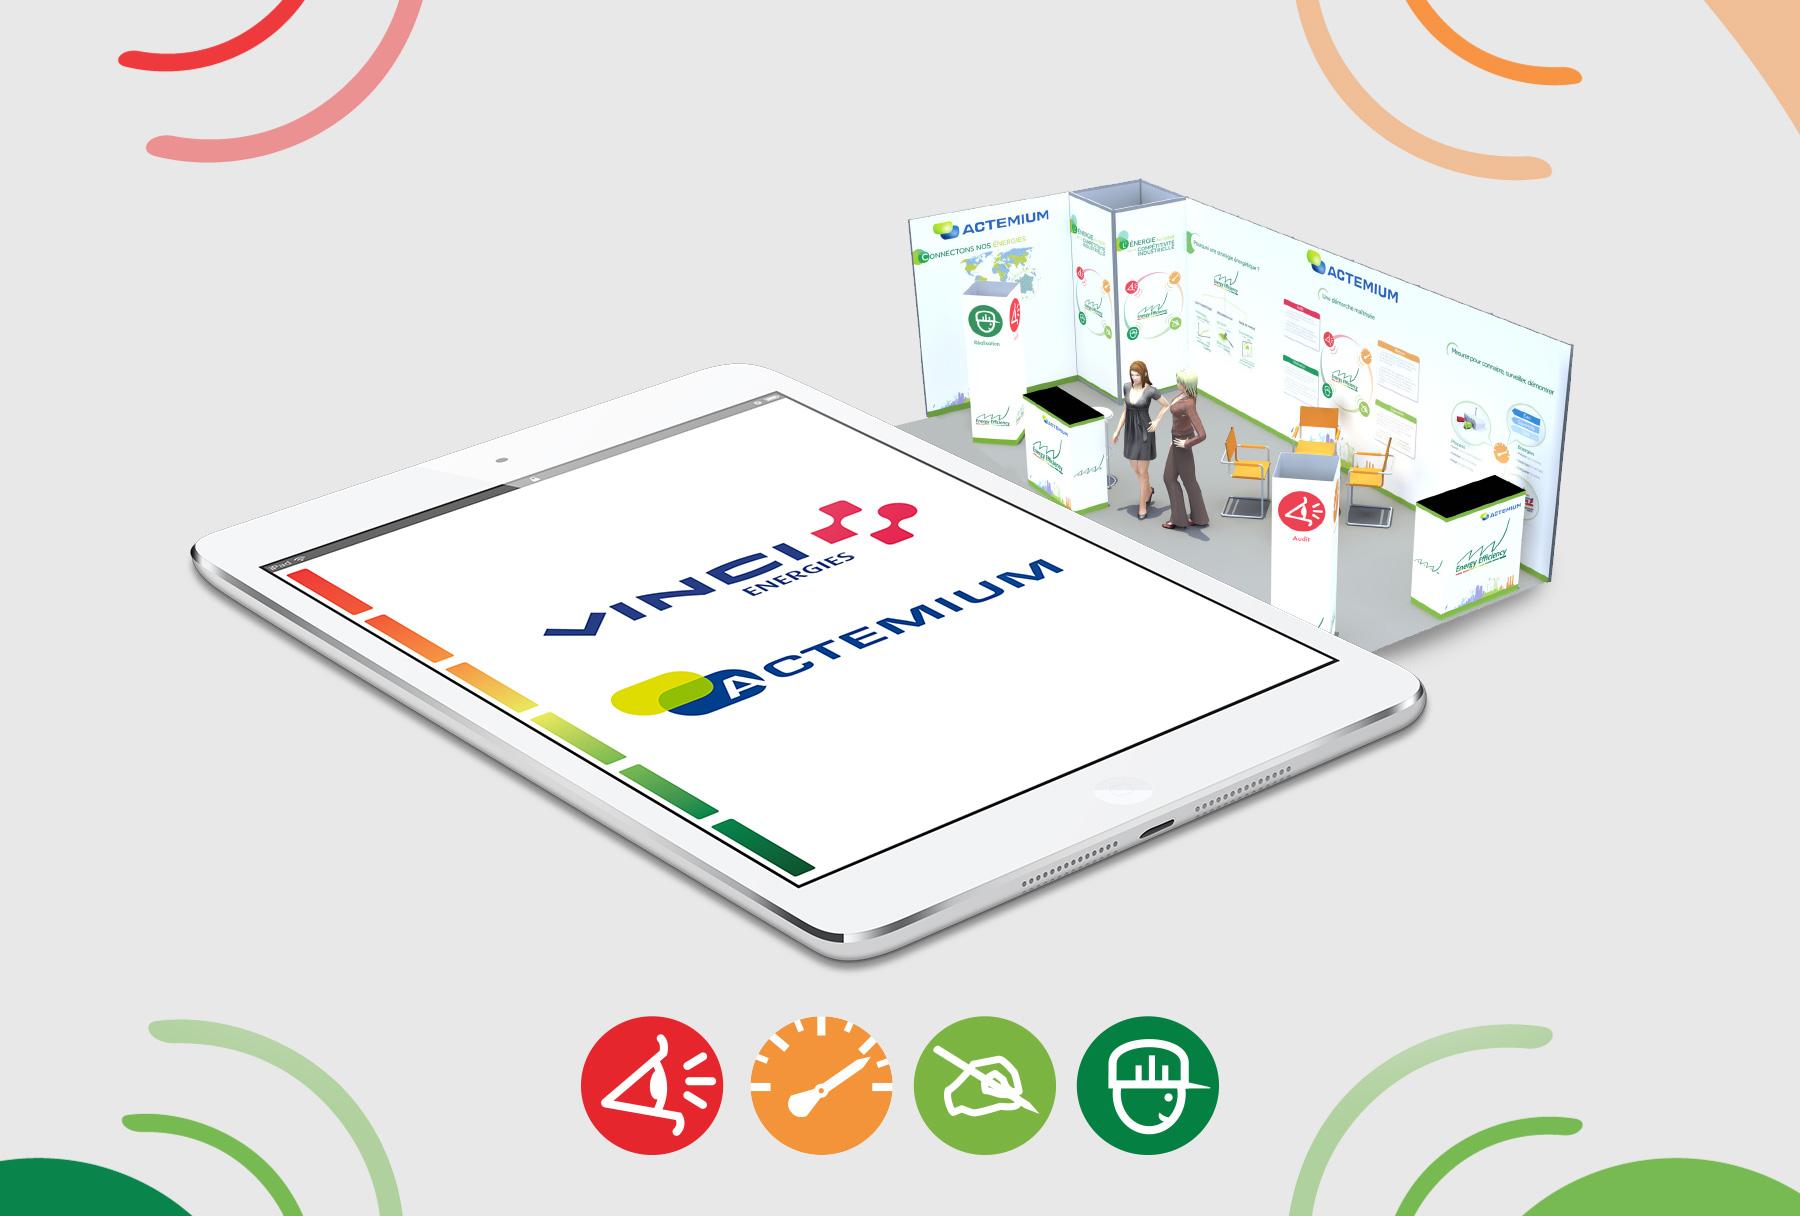 vinci-energies-application-realite-augmentee-tiz